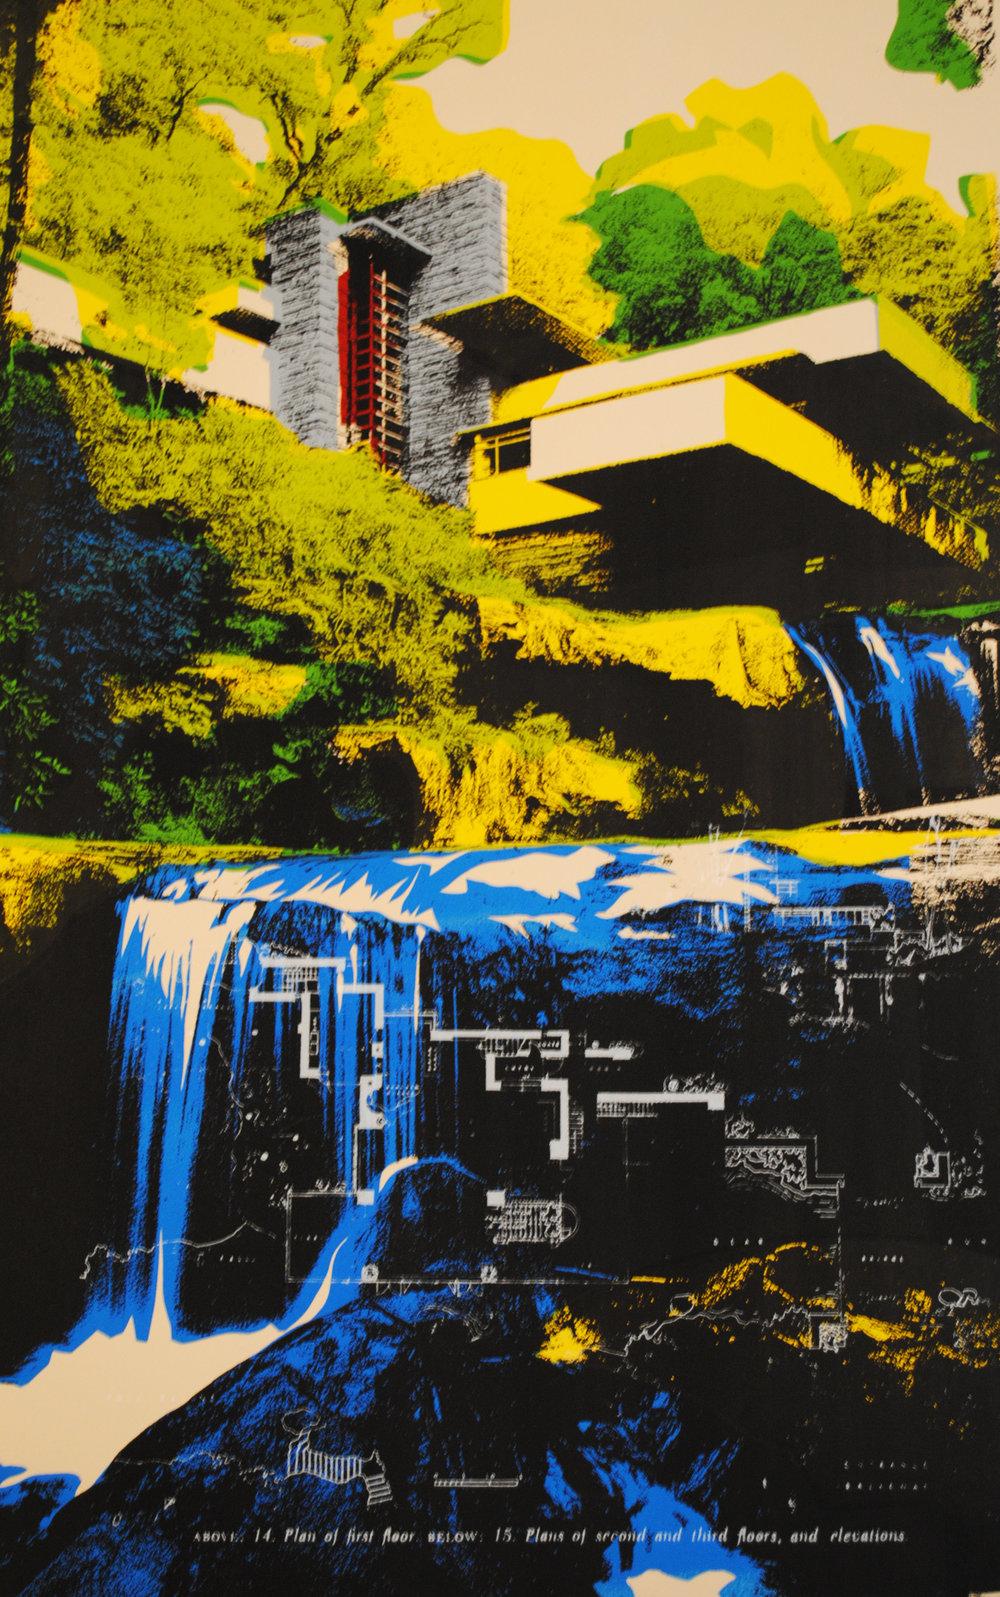 O_005_Falling Water ScreenPrint.jpg